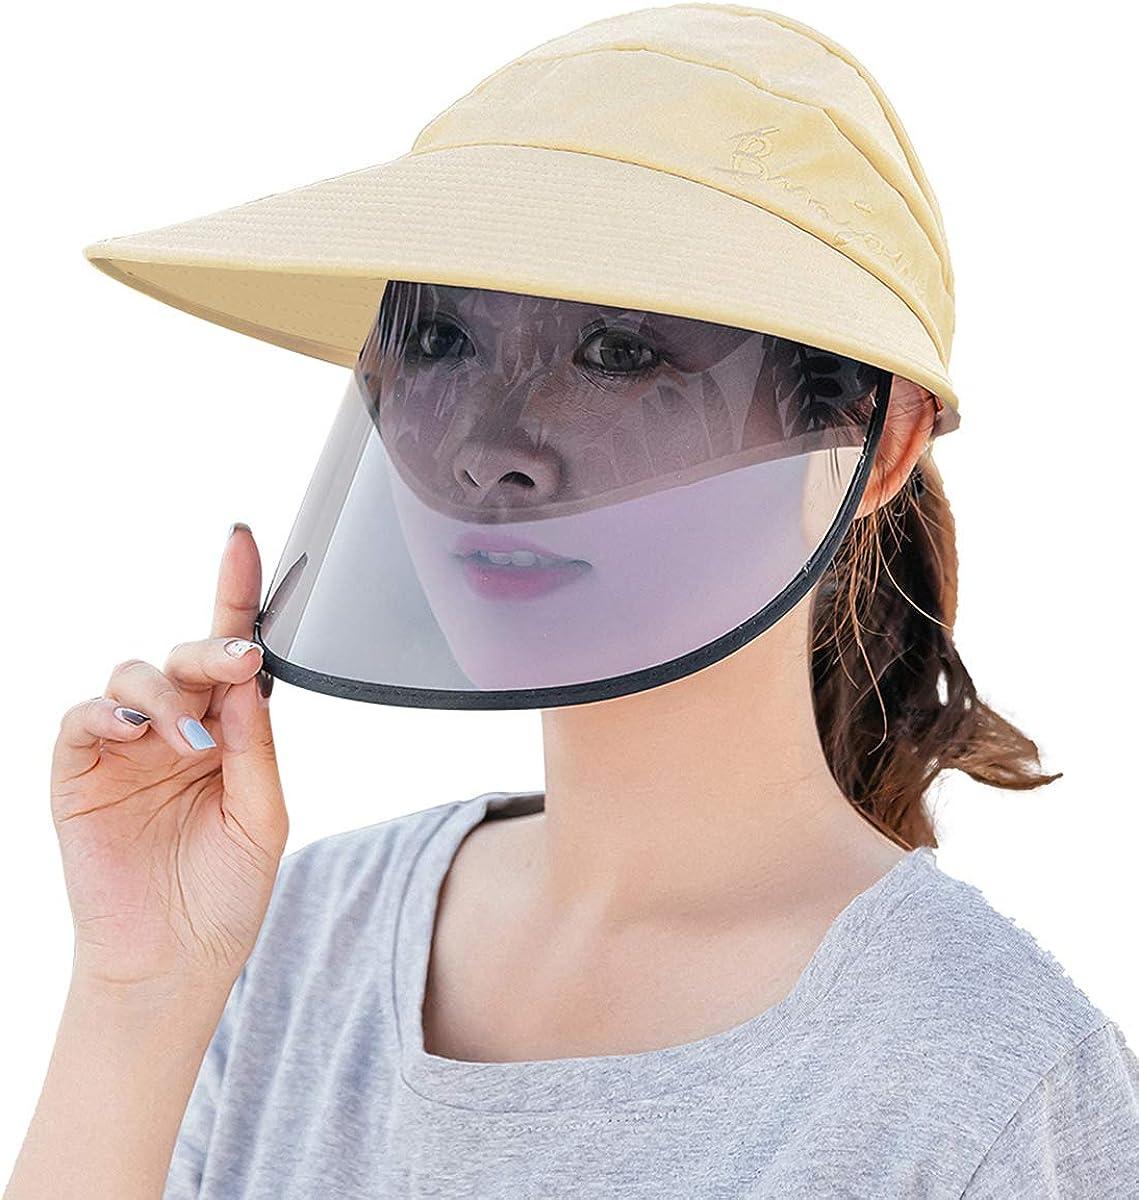 FEOYA Unisex Safety Face Shield Hat Visor UV Protection Summer Beach Hat for Outdoor